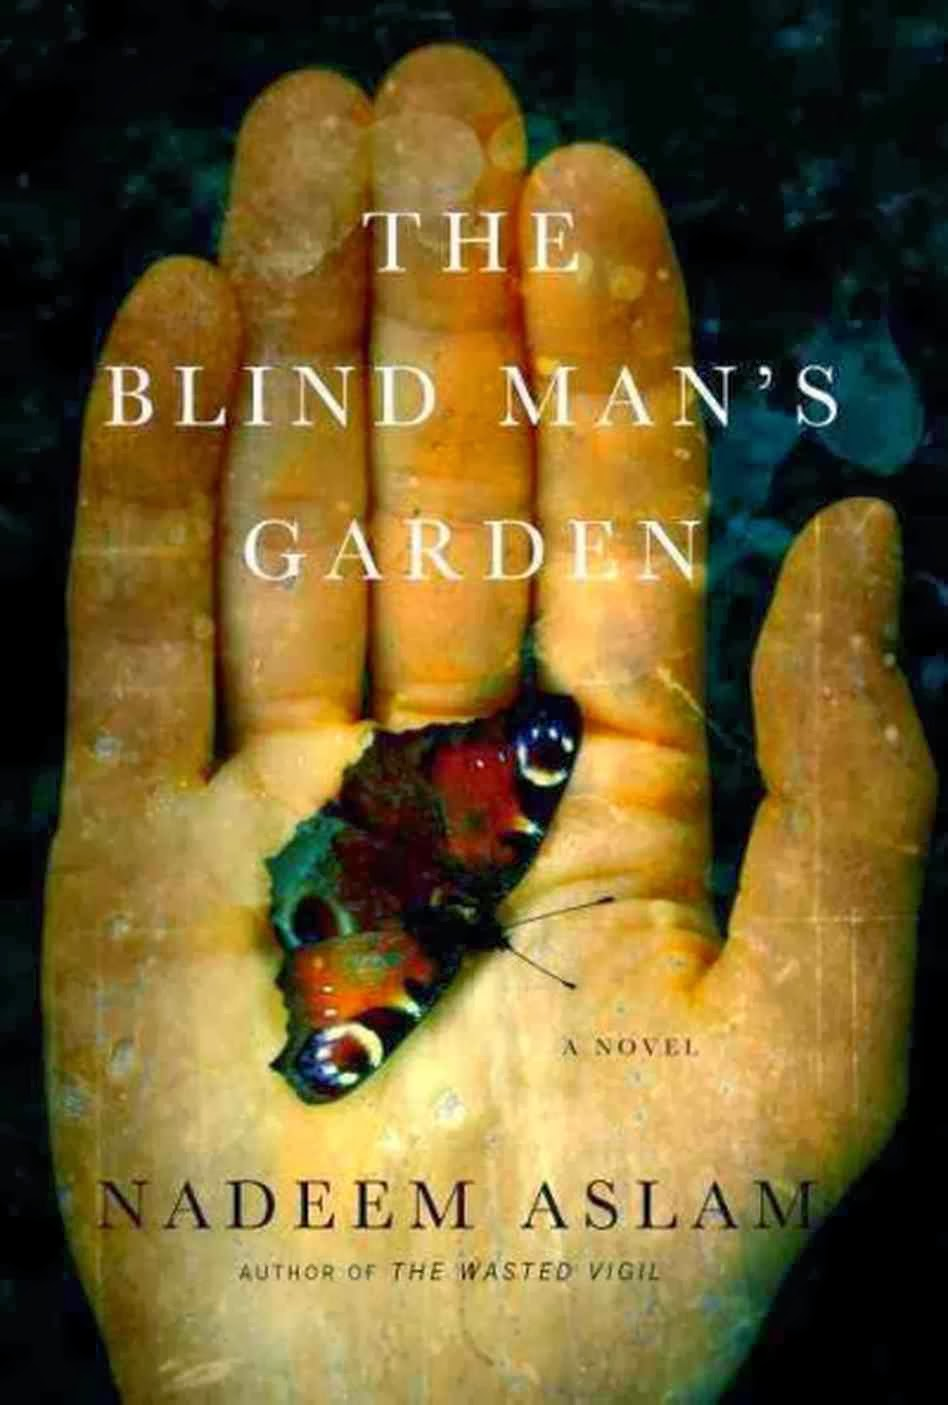 http://discover.halifaxpubliclibraries.ca/?q=title:blind%20man%27s%20garden